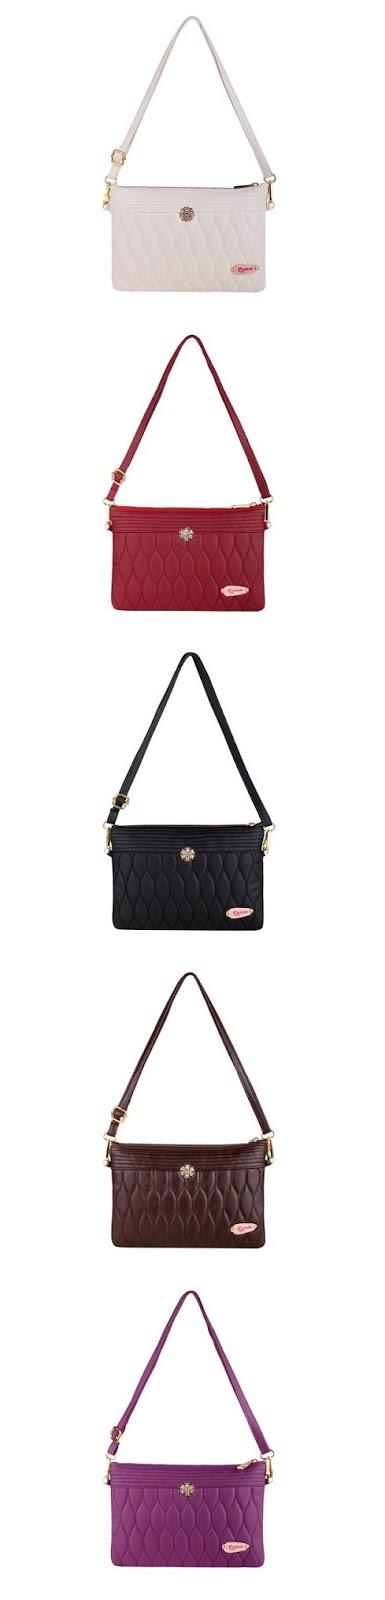 tas sling bag wanita online, harga tas sling bag wanita, grosir tas sling bag wanita murah